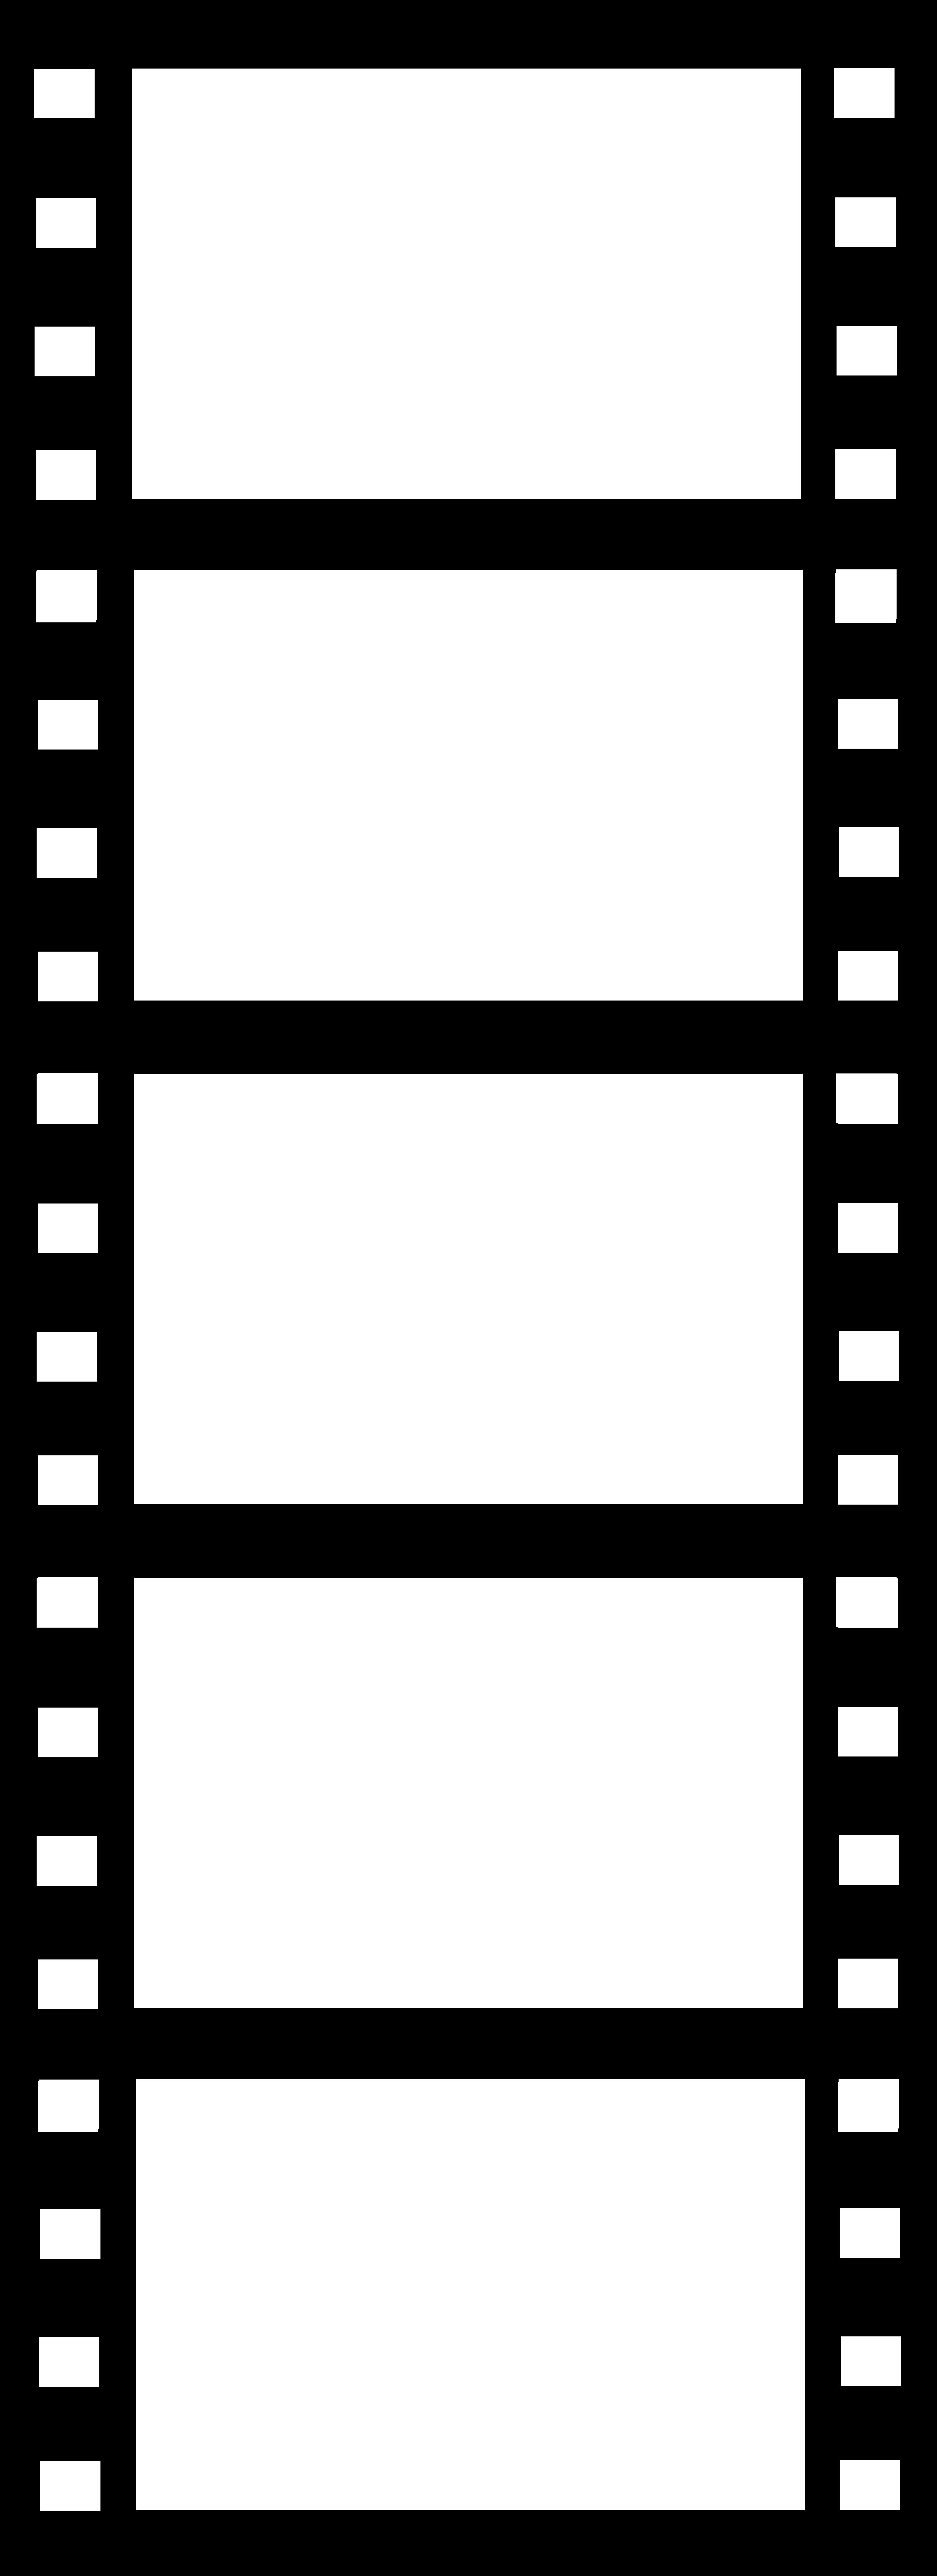 Film Strip | Pano | Pinterest | Films, Clip art and Scrapbooking